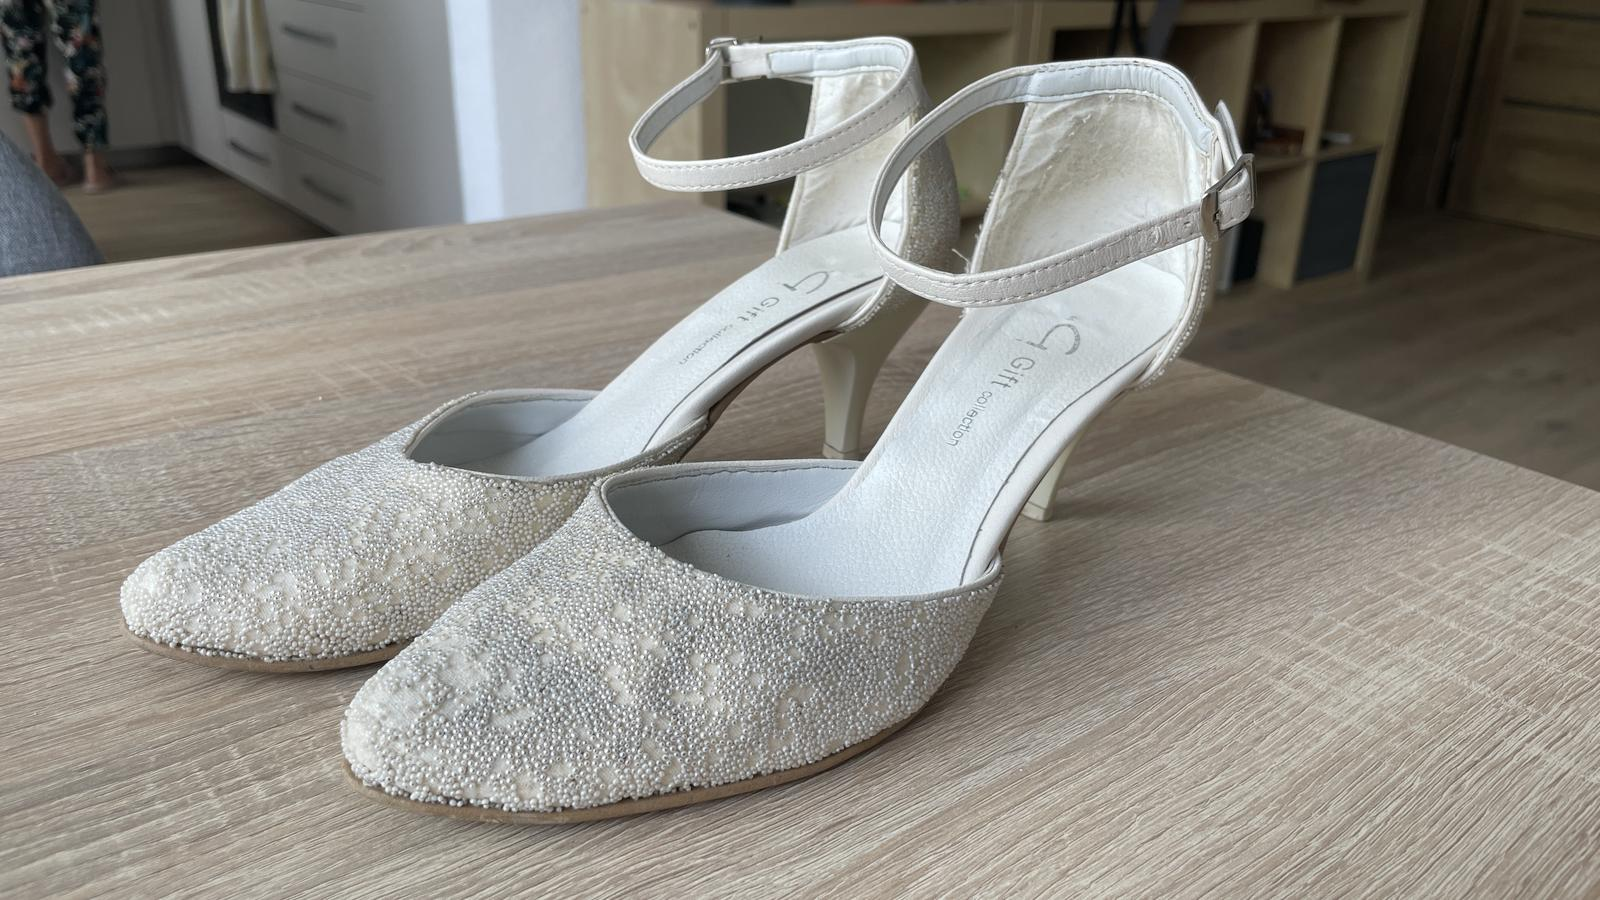 Biele svadobné topánky - Obrázok č. 1